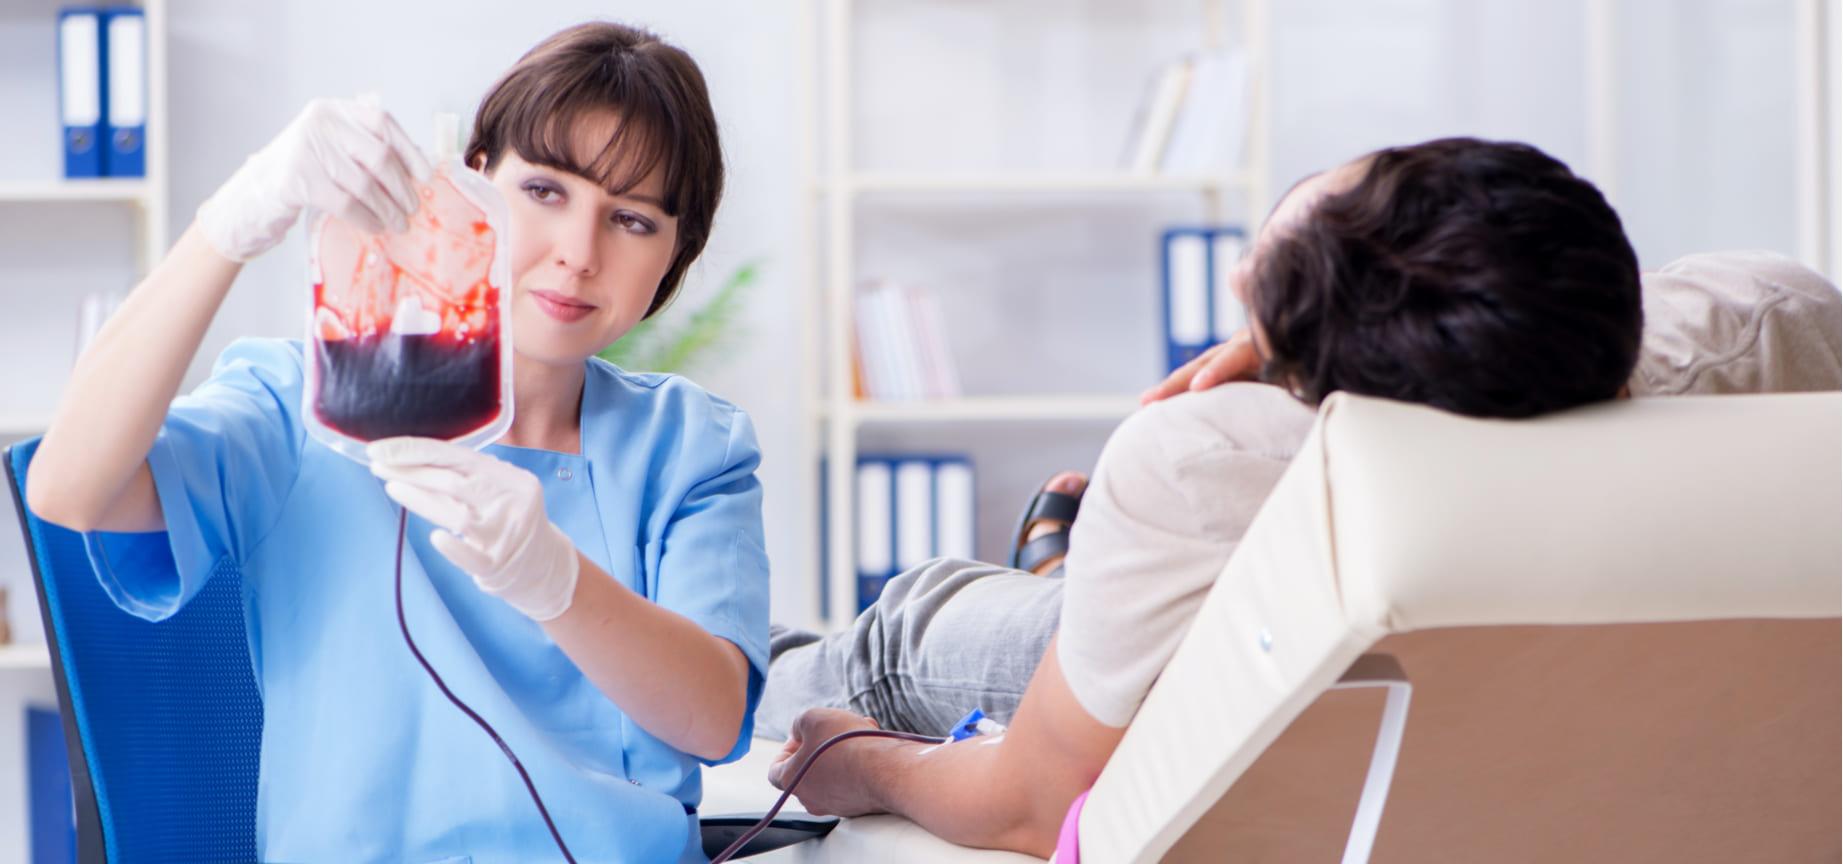 Mayor riesgo de COVID-19 en pacientes con talasemia que son transfundidos regularmente